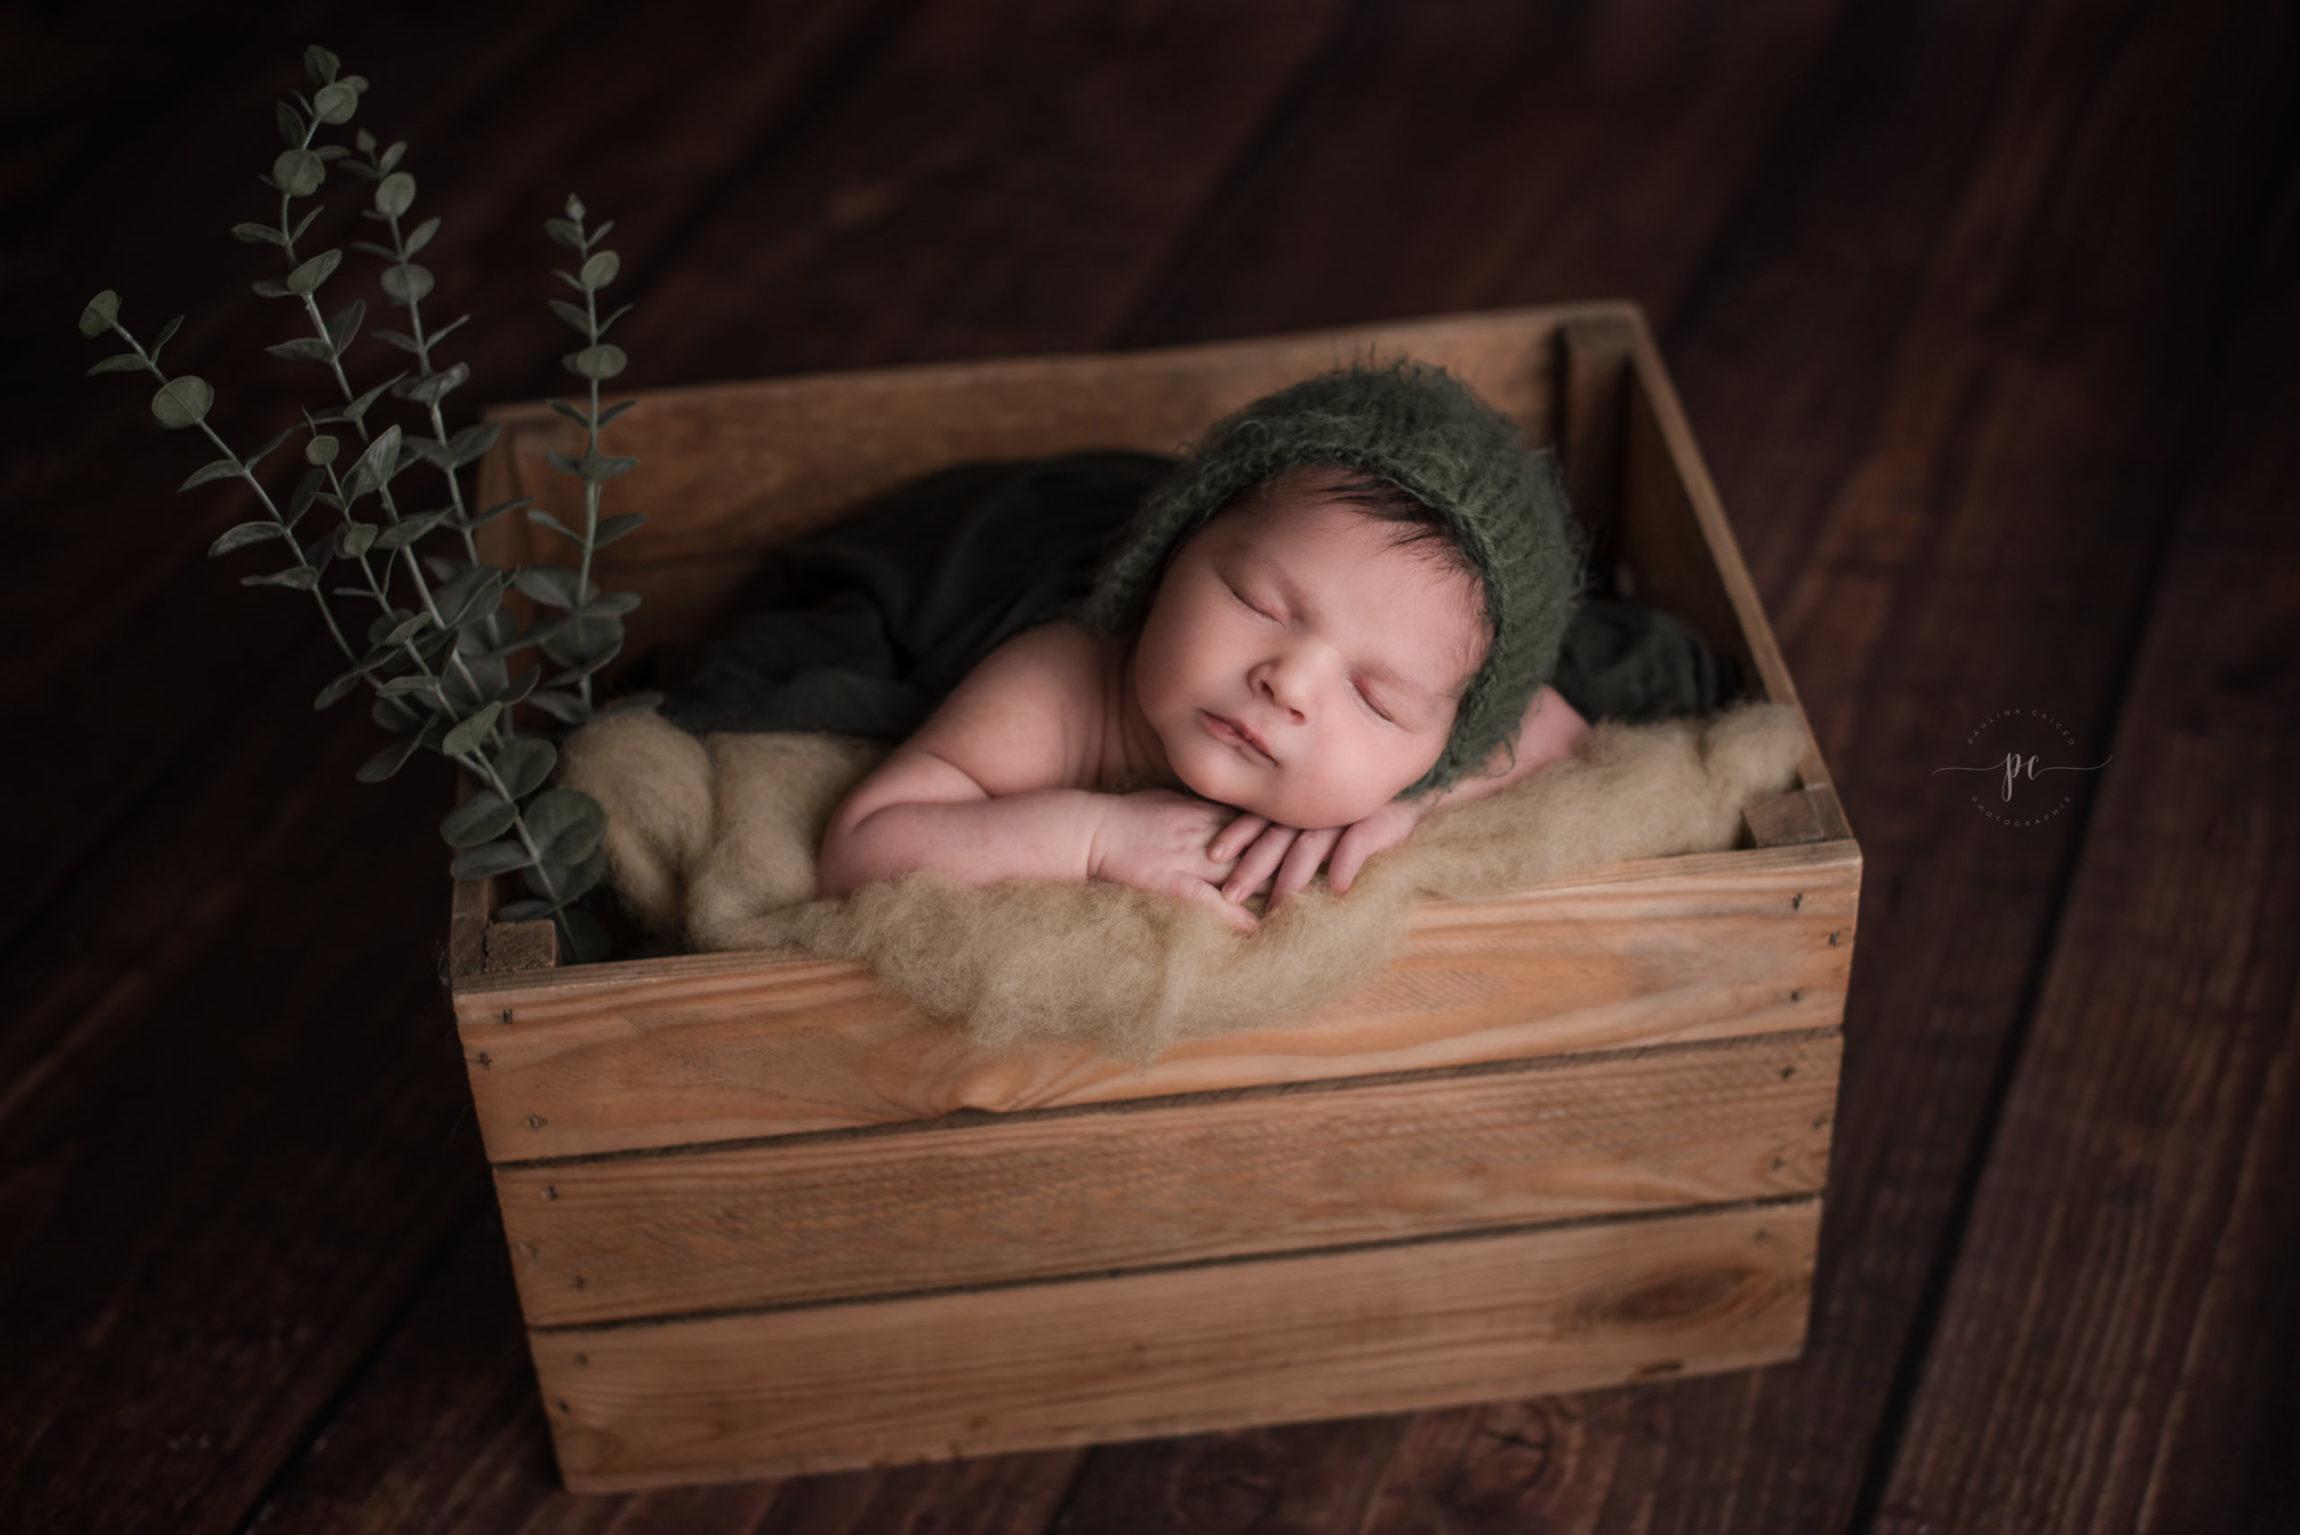 photographe nouveau né angers naissance malone scaled e1602275420820